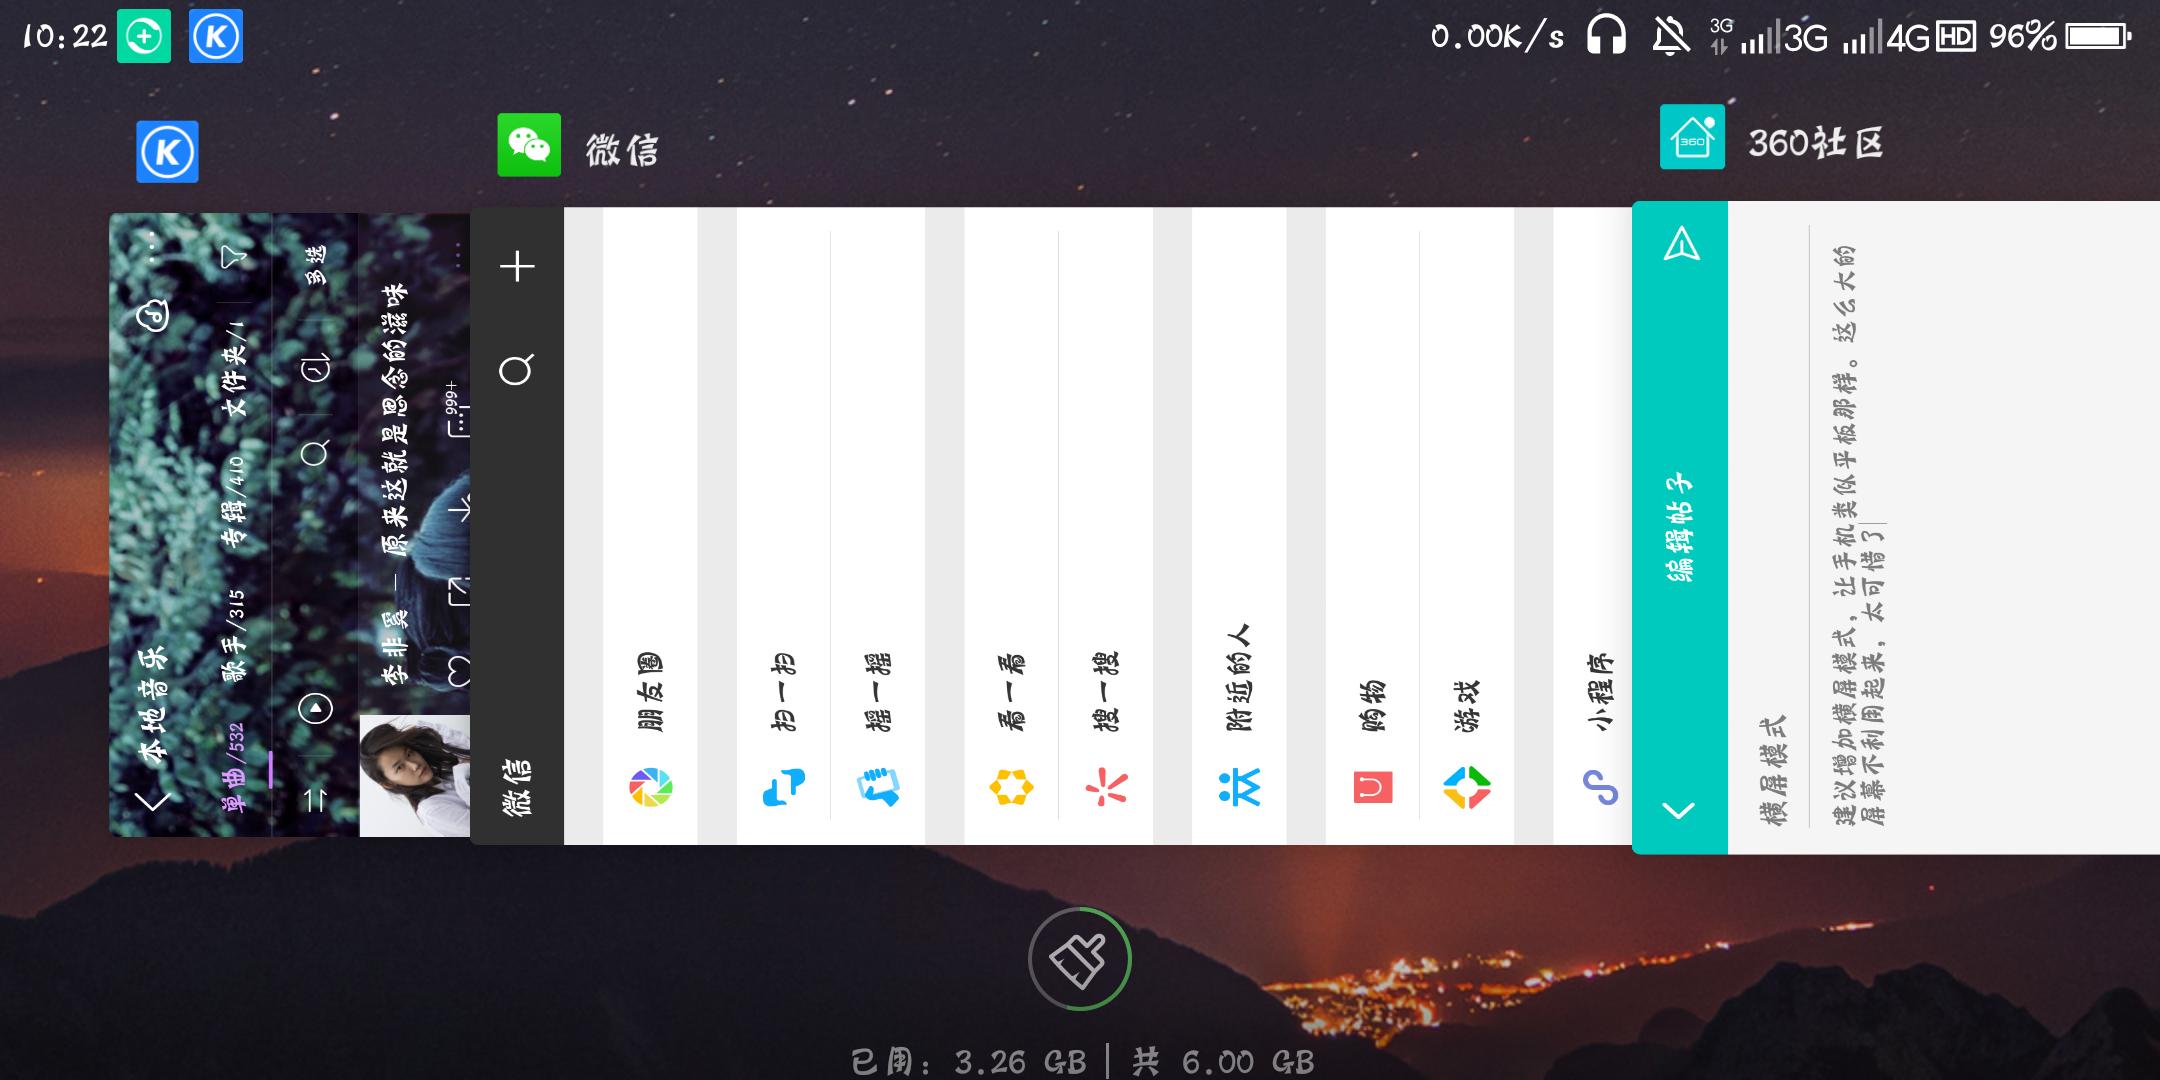 Screenshot_2018-12-09-10-22-11.png